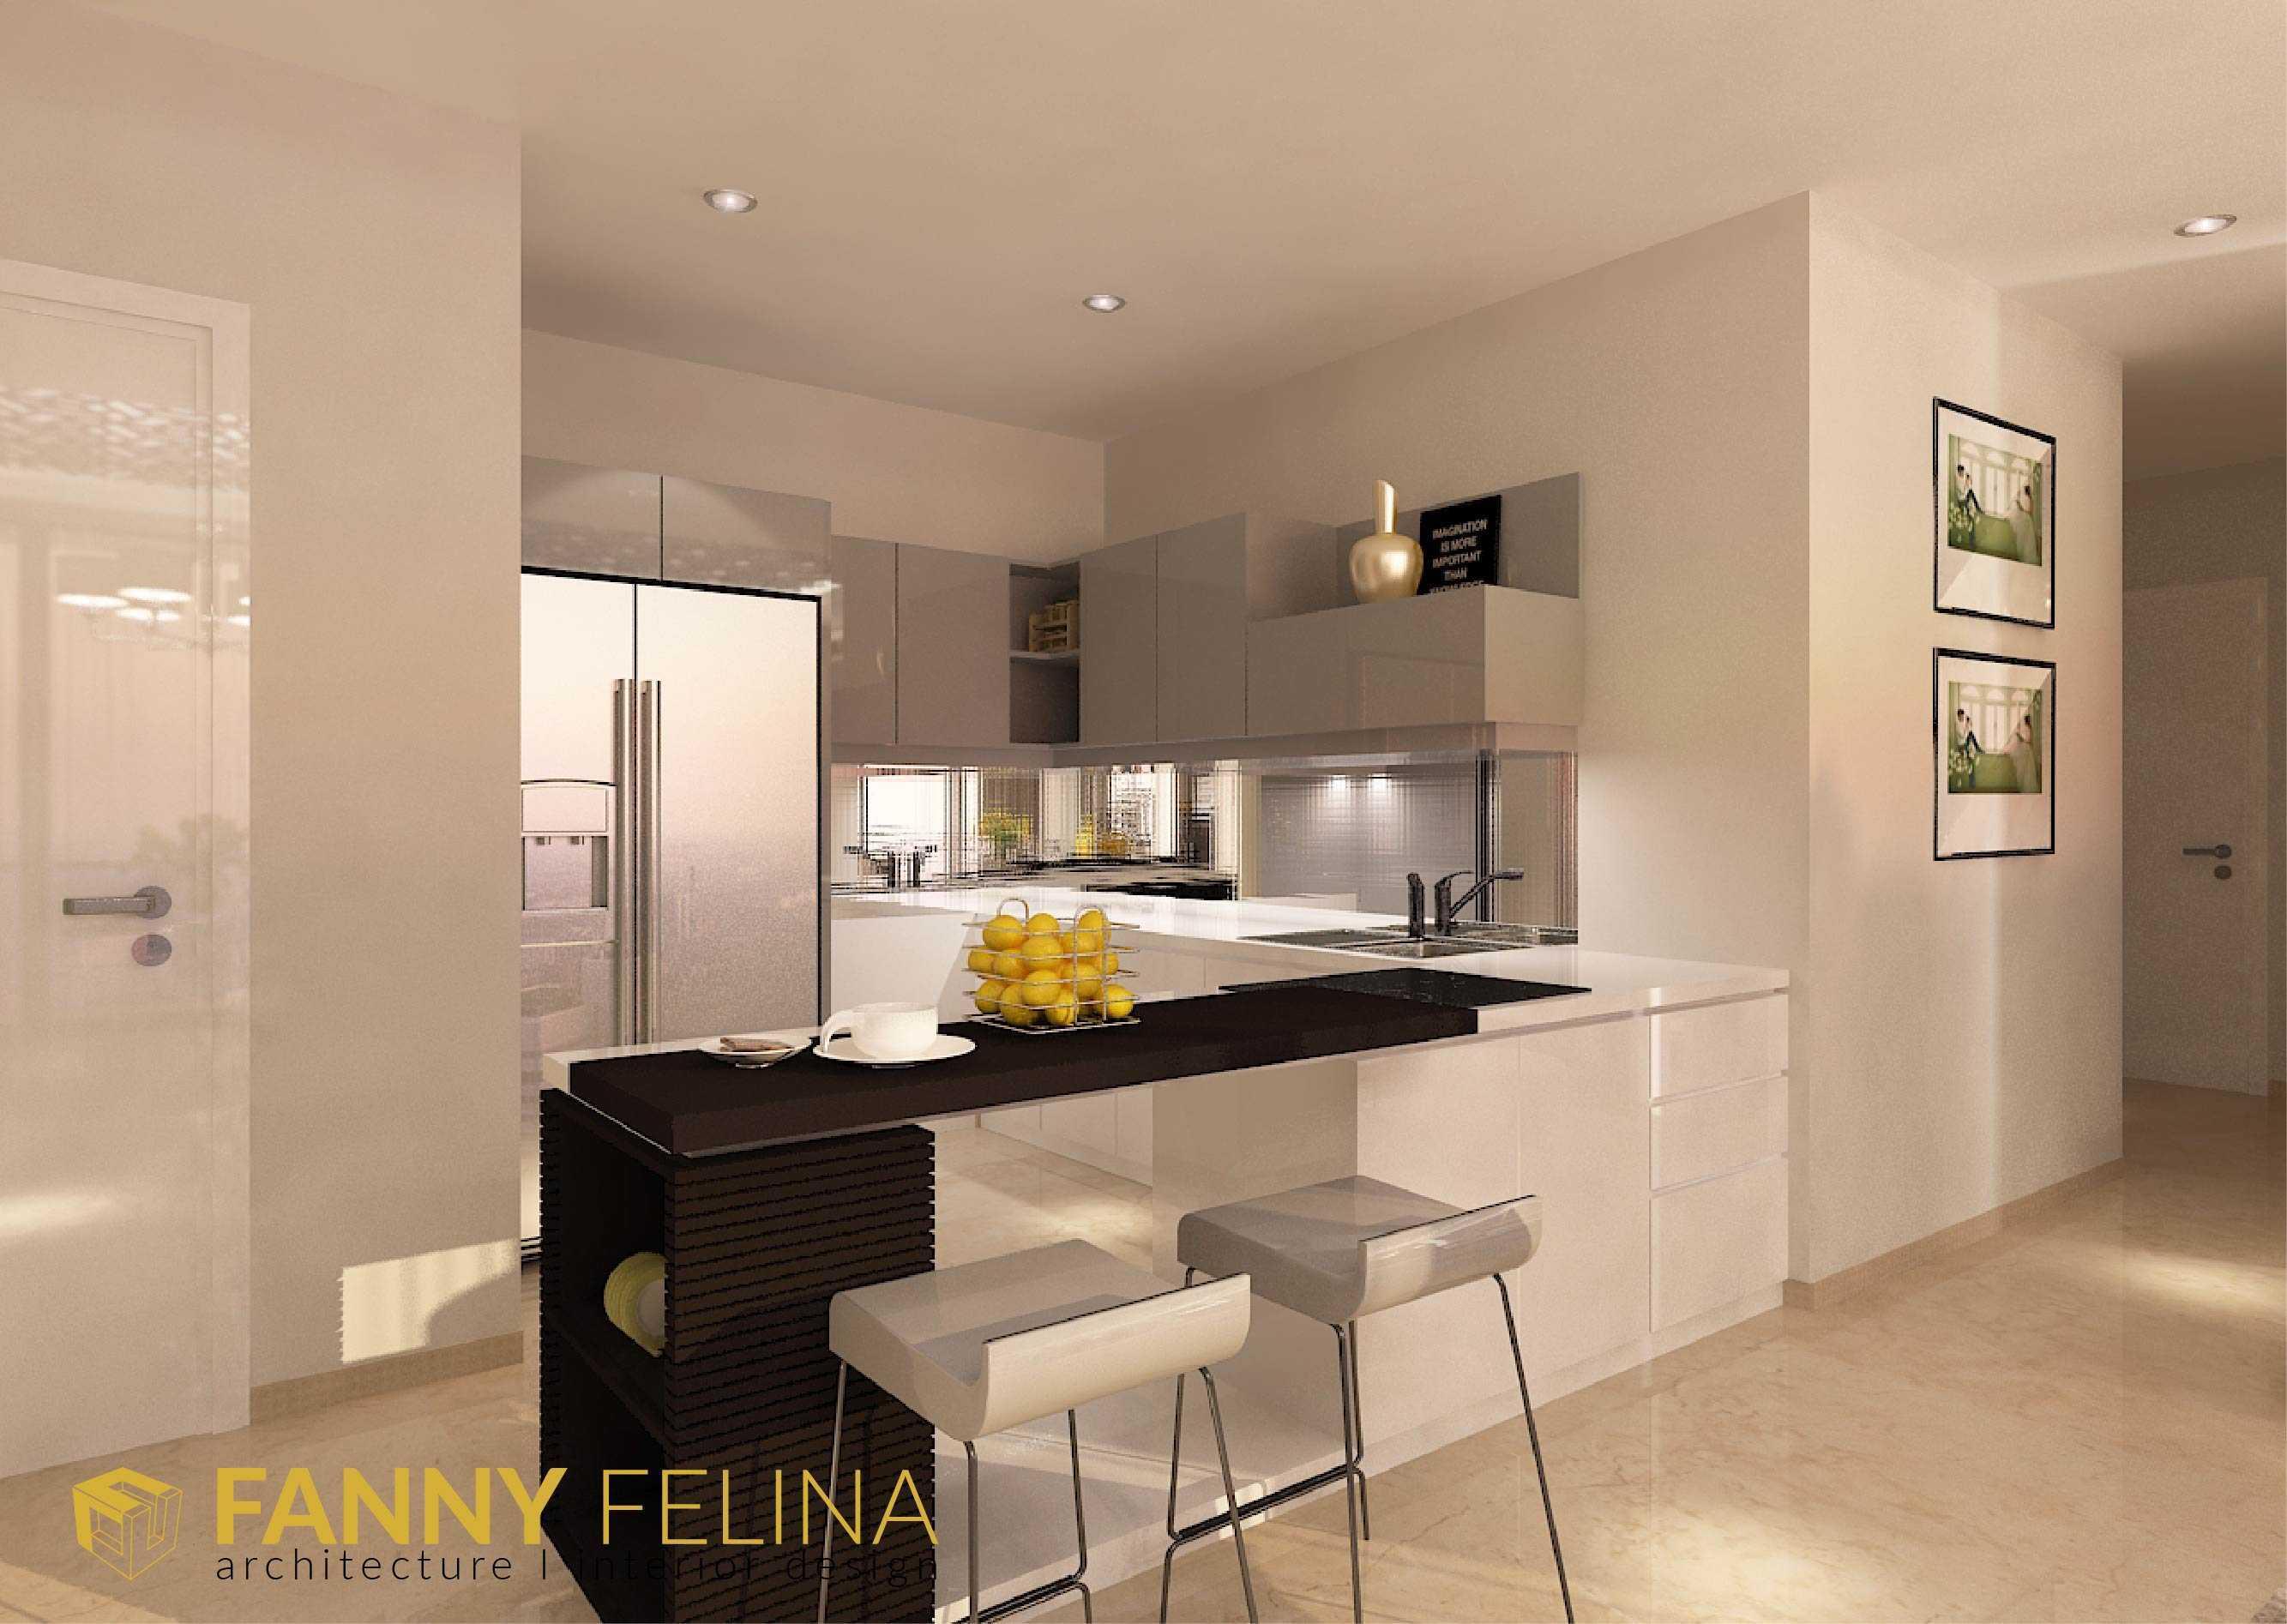 Fanny Felina Architecture & Interior Design Voila Apartment Surabaya, Surabaya City, East Java, Indonesia Surabaya, Surabaya City, East Java, Indonesia Voila-04 Kontemporer  41196